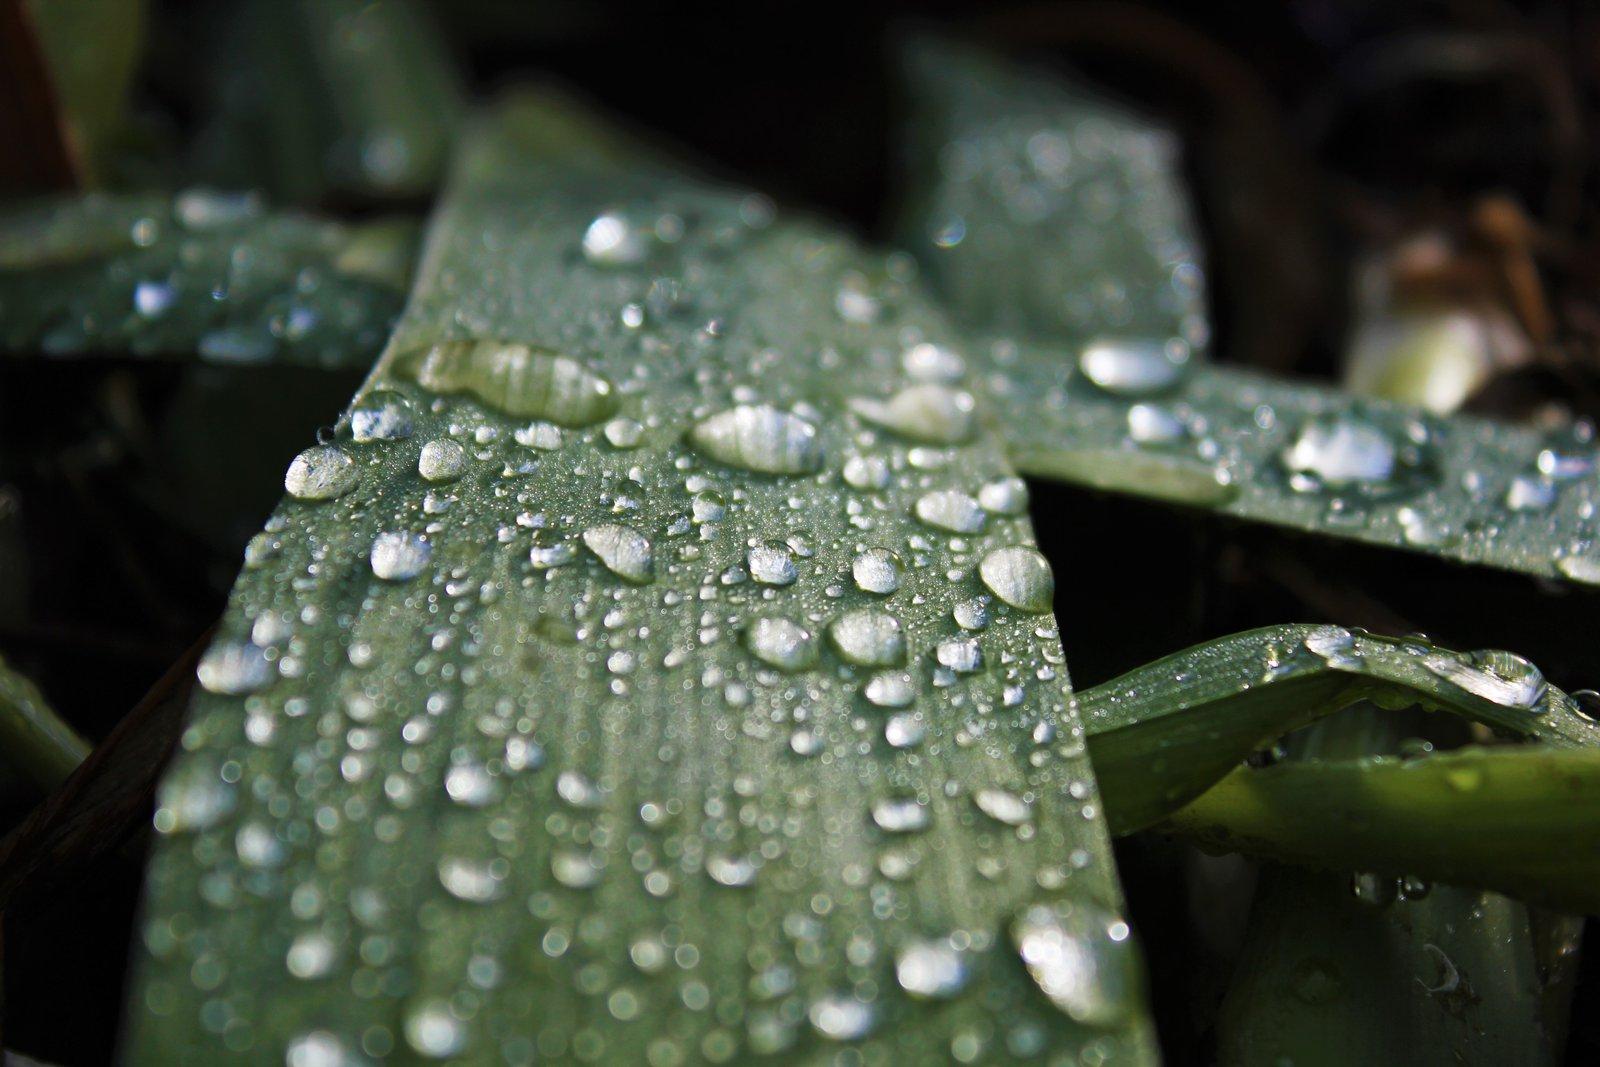 watery glass blade